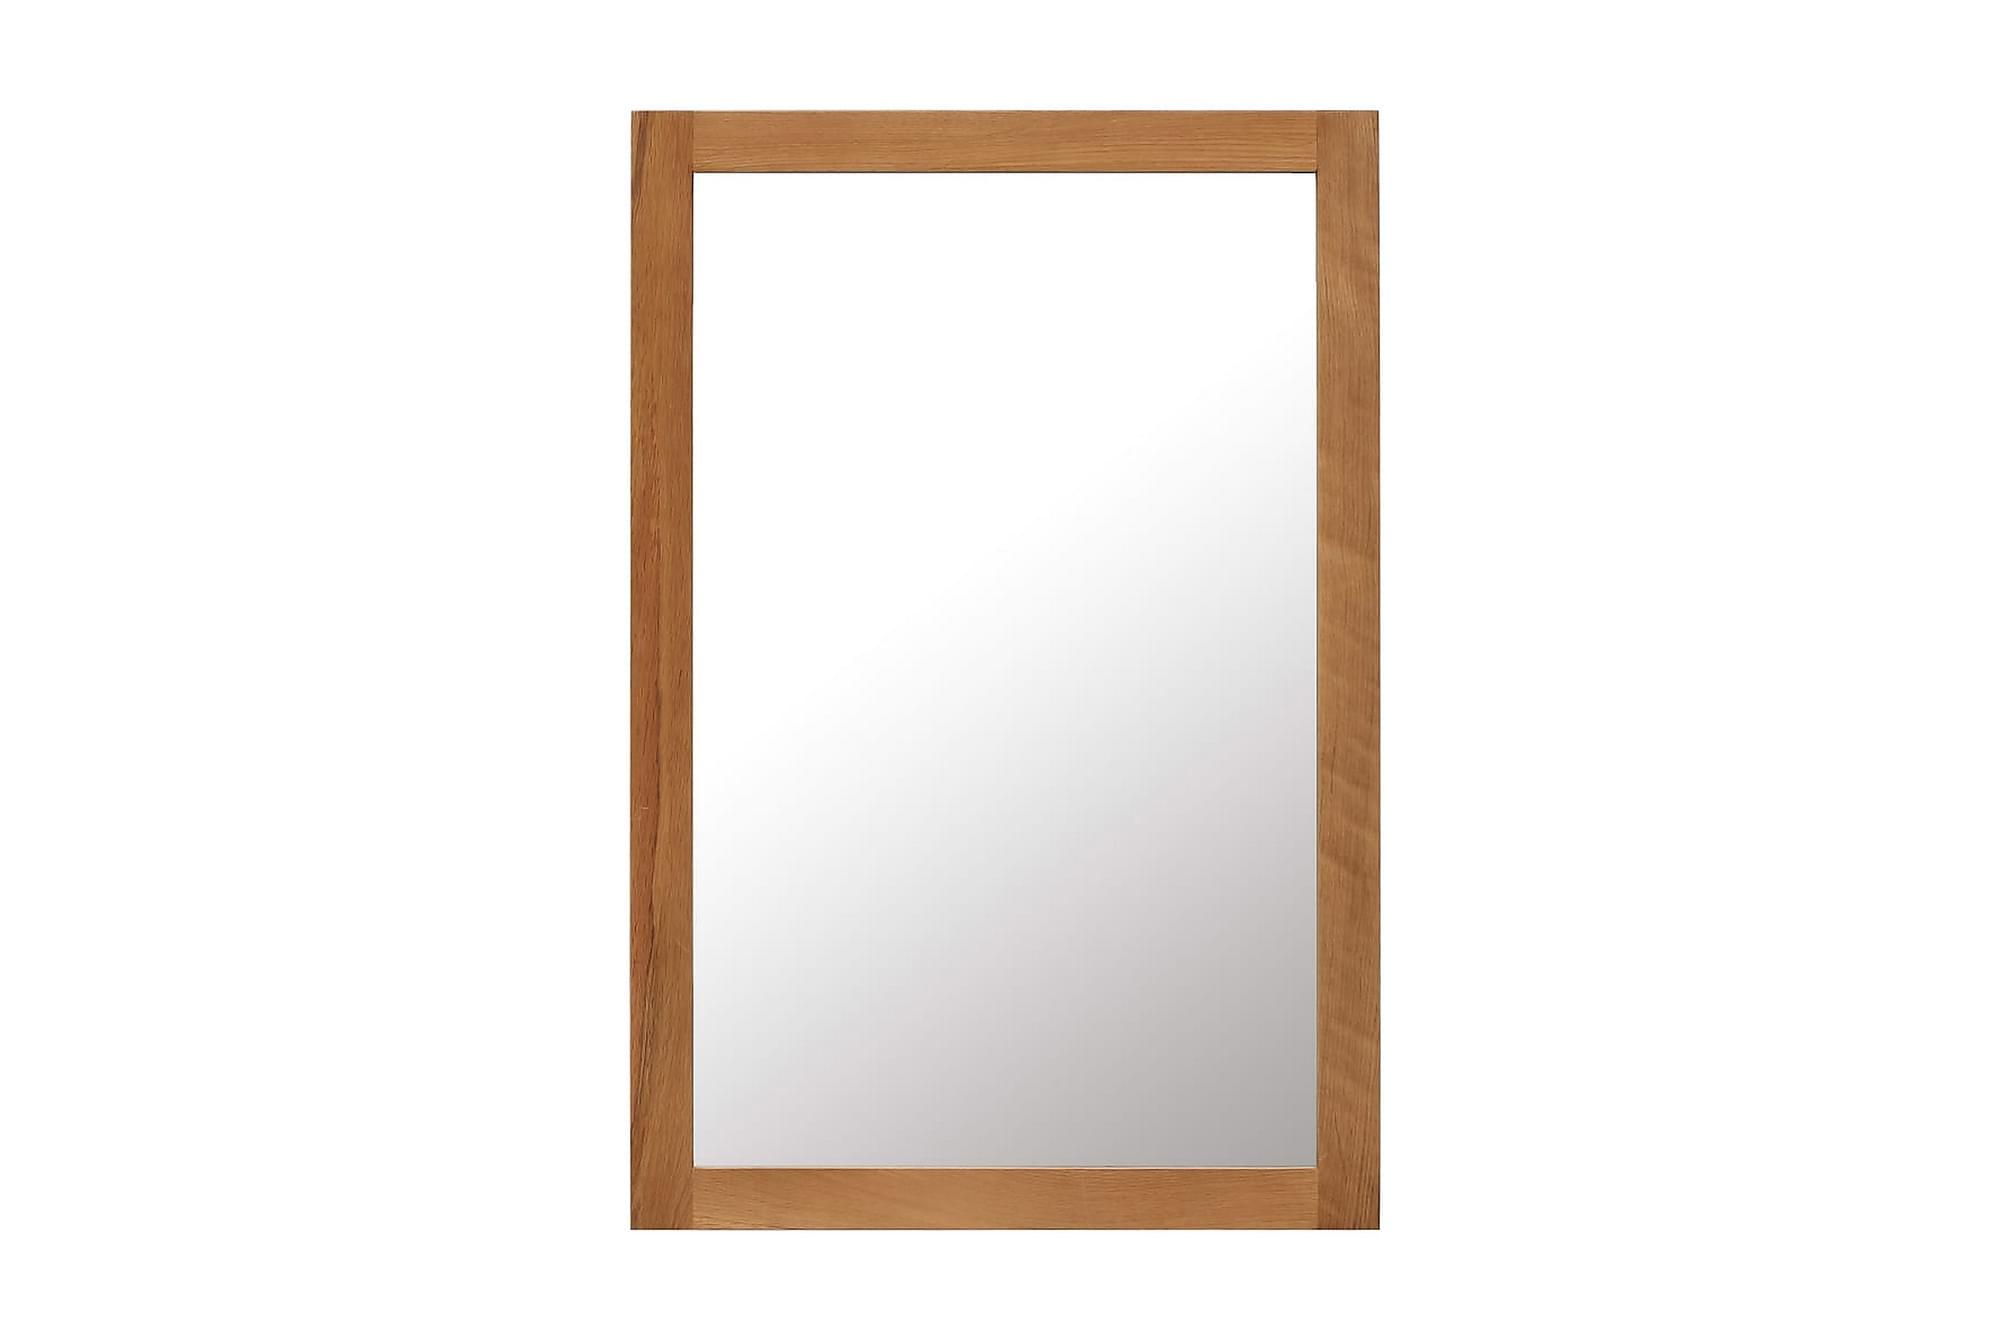 Spegel 60x90 cm massiv ek